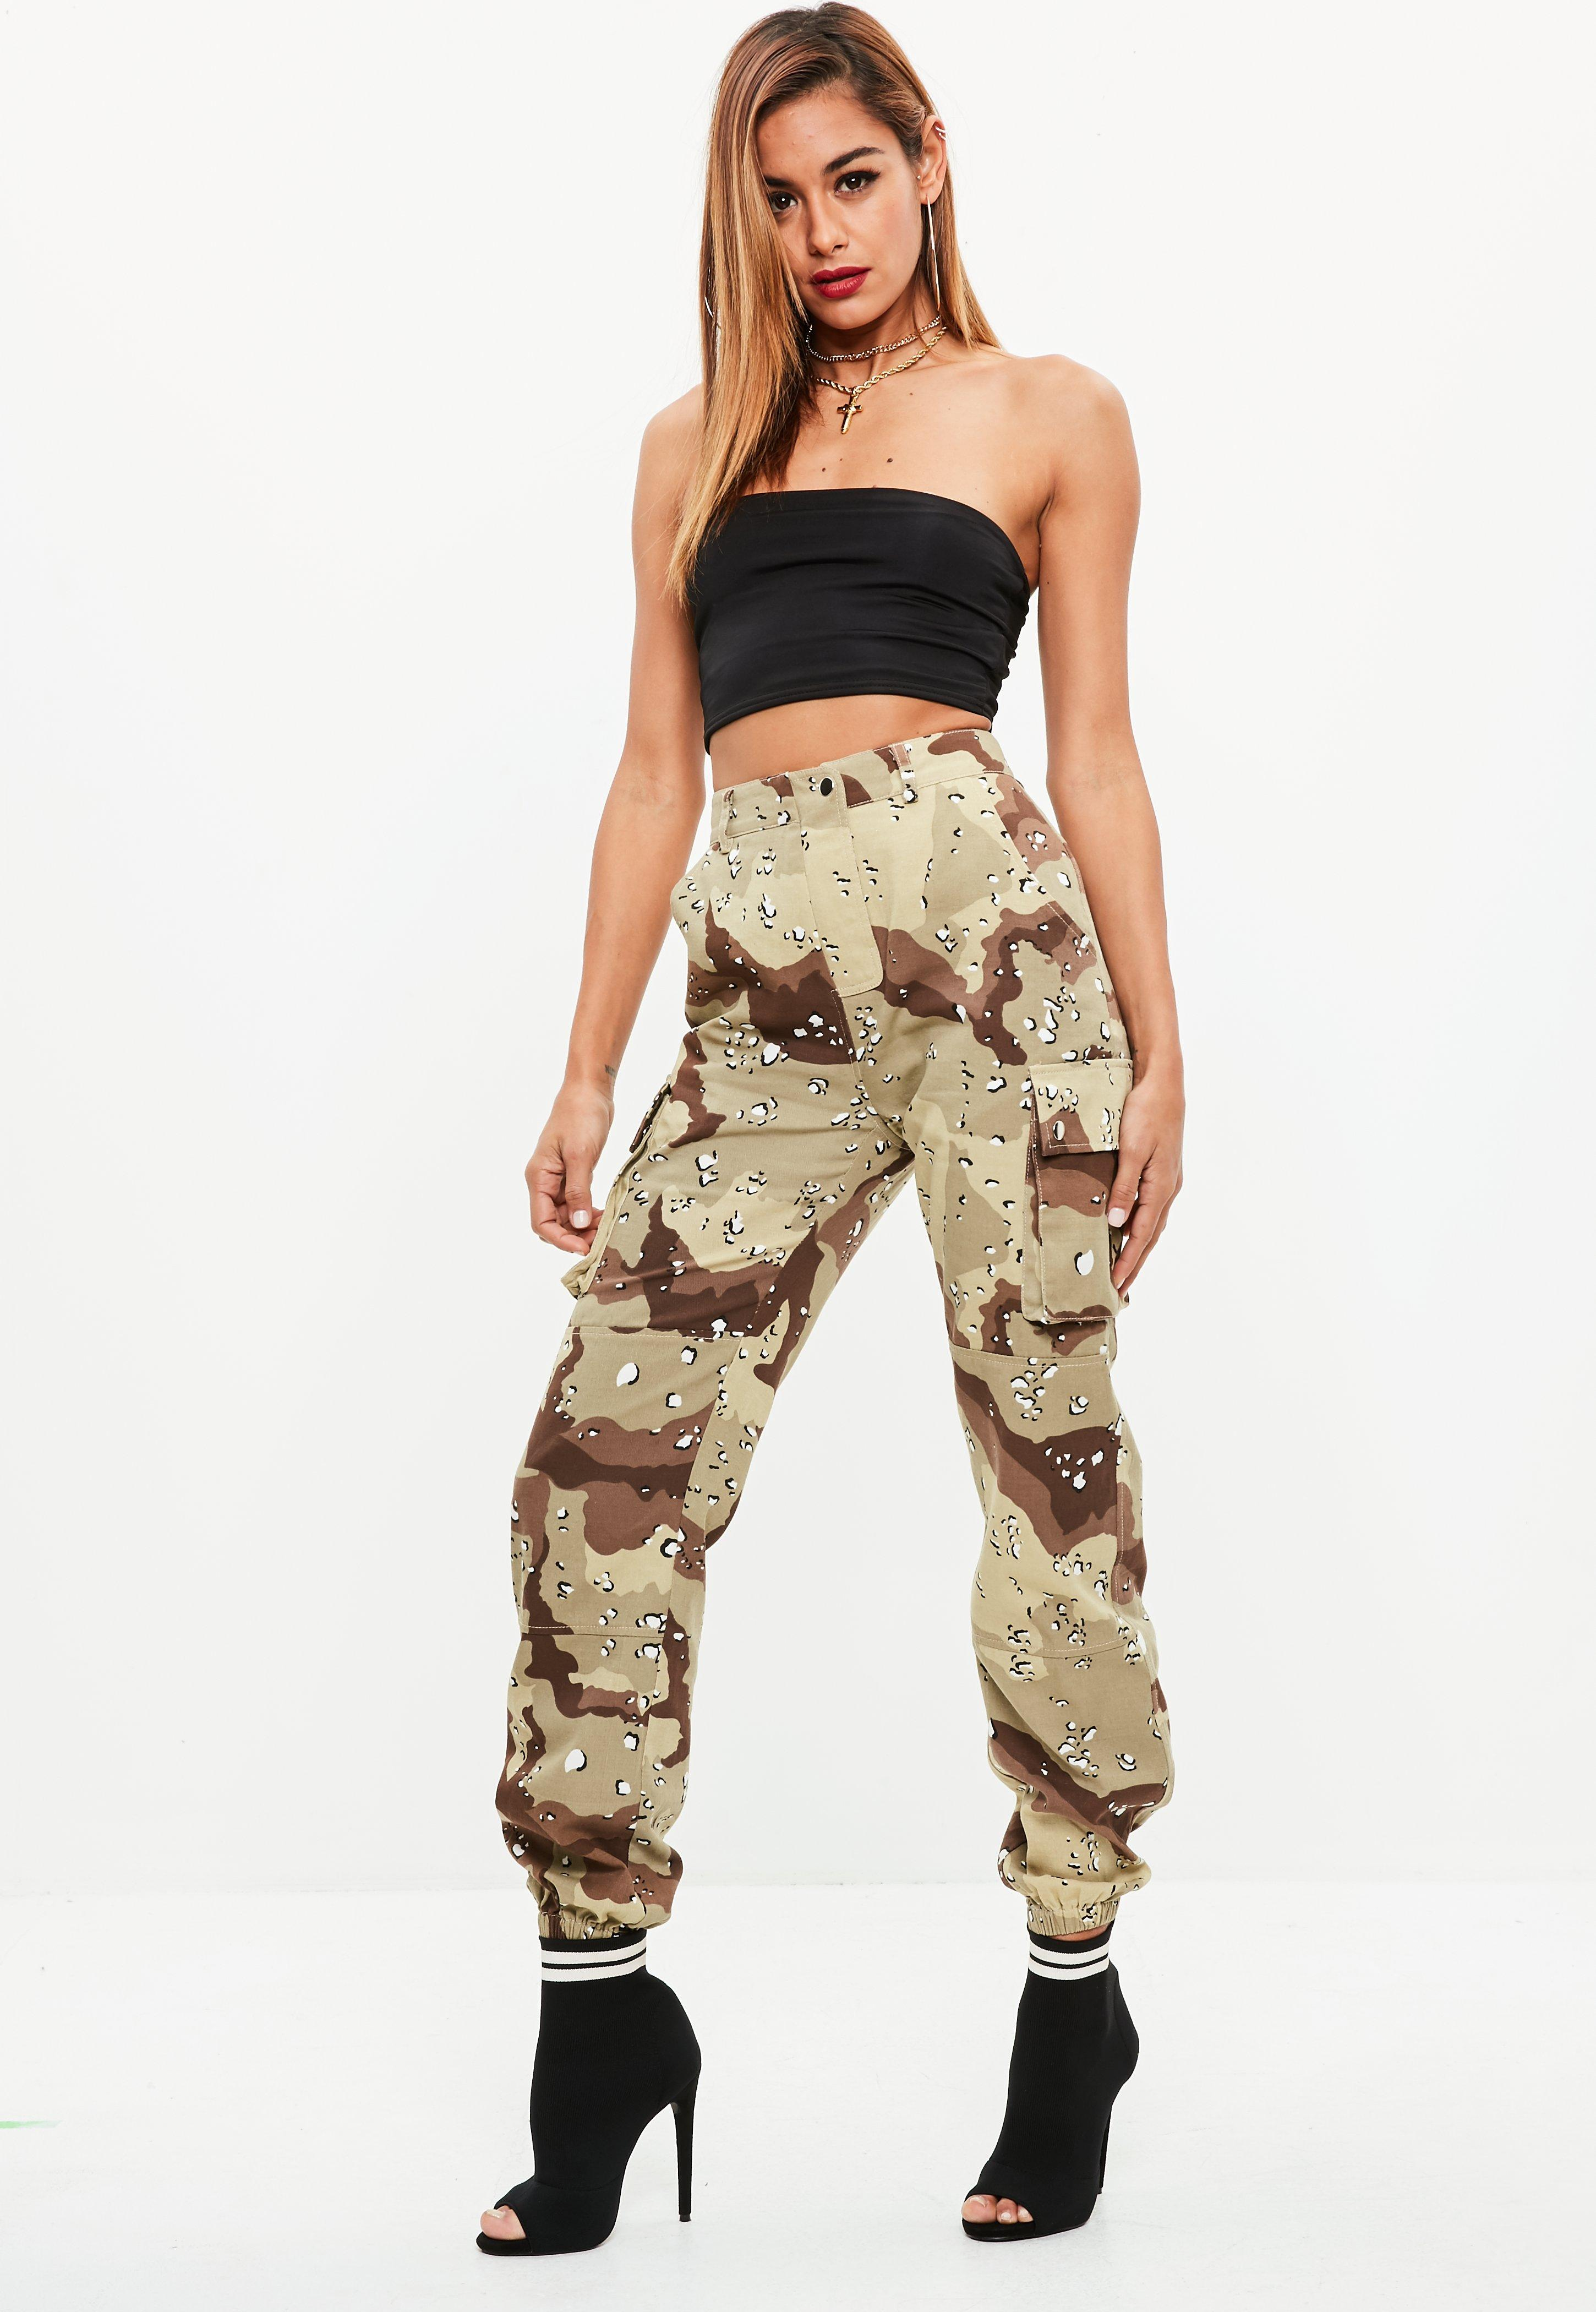 Missguided Premium Khaki Camo Printed Cargo Trousers Comfortable Sale Online 100% Original Low Shipping Sale Online Visit New Cheap Online Sale Popular iXamlOvq